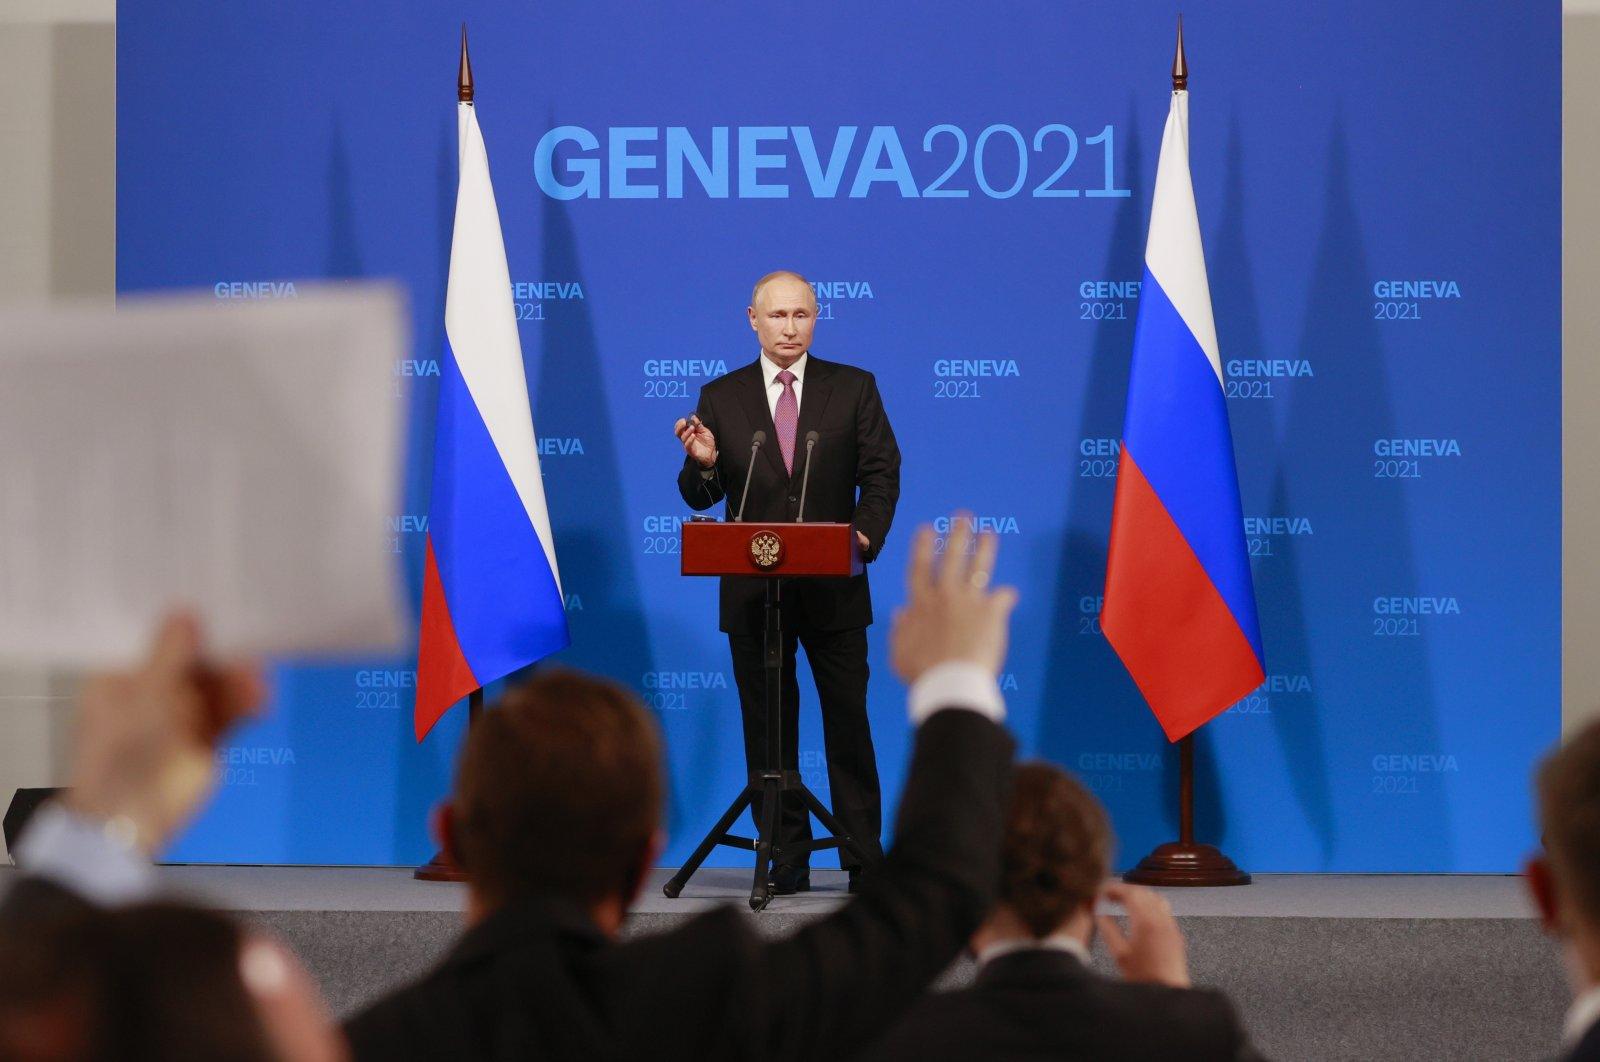 Russia's President Vladimir Putin addresses the media during a press conference after the U.S.-Russia summit with U.S. President Joe Biden at Villa La Grange in Geneva, Switzerland, June 16, 2021. (AP Photo)